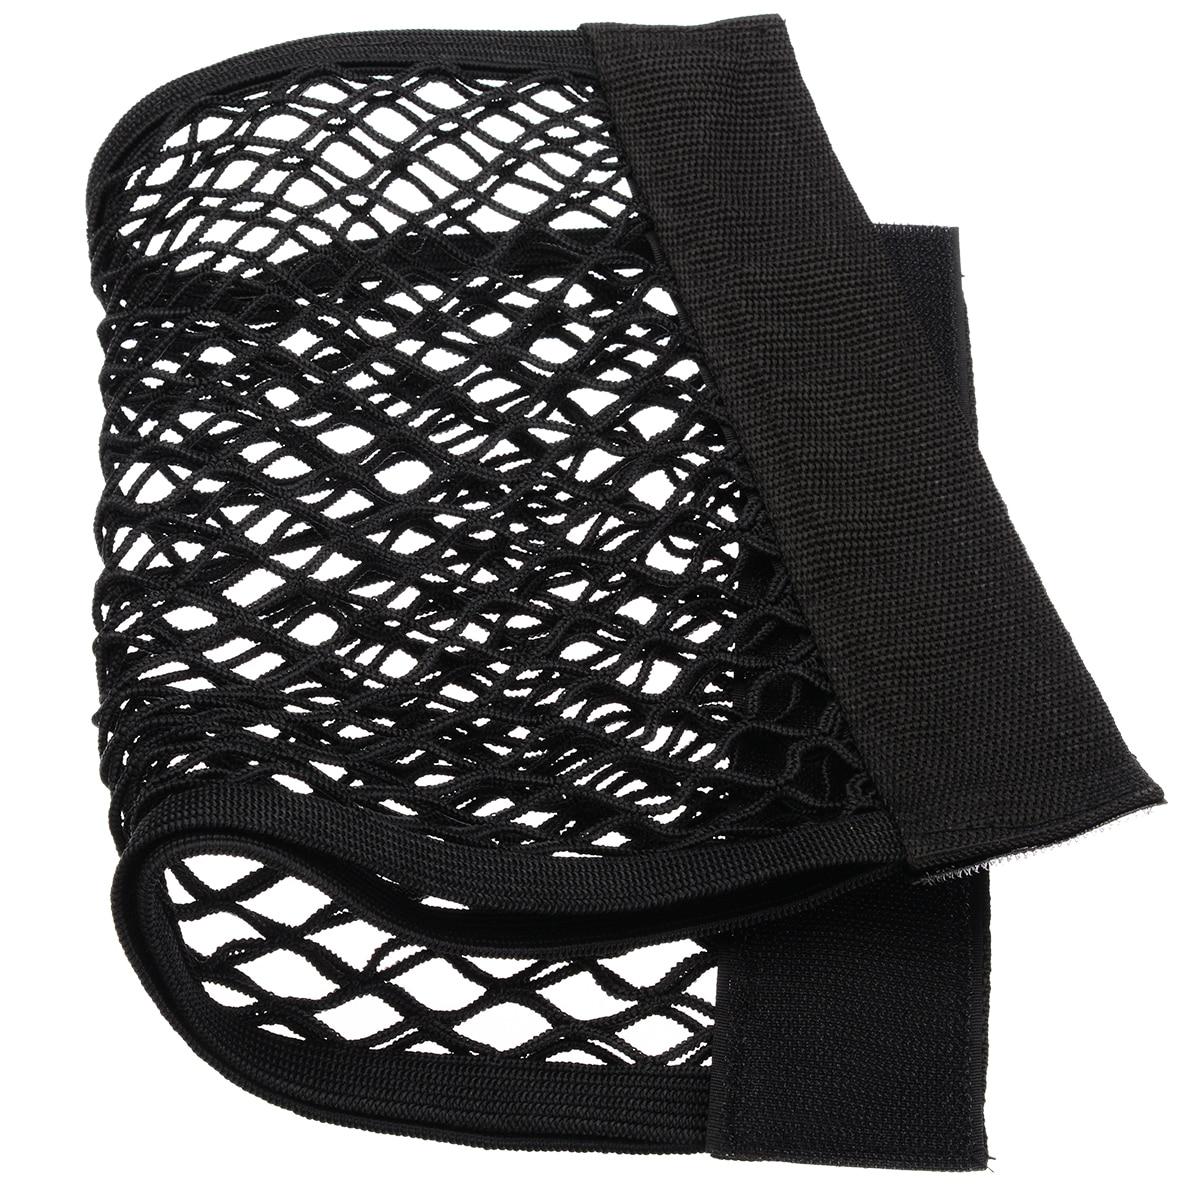 1 pc 40*25CM Car Styling Car Back Rear Trunk Seat Elastic String Net Mesh Storage Bag Pocket Cage Car Interior Nets